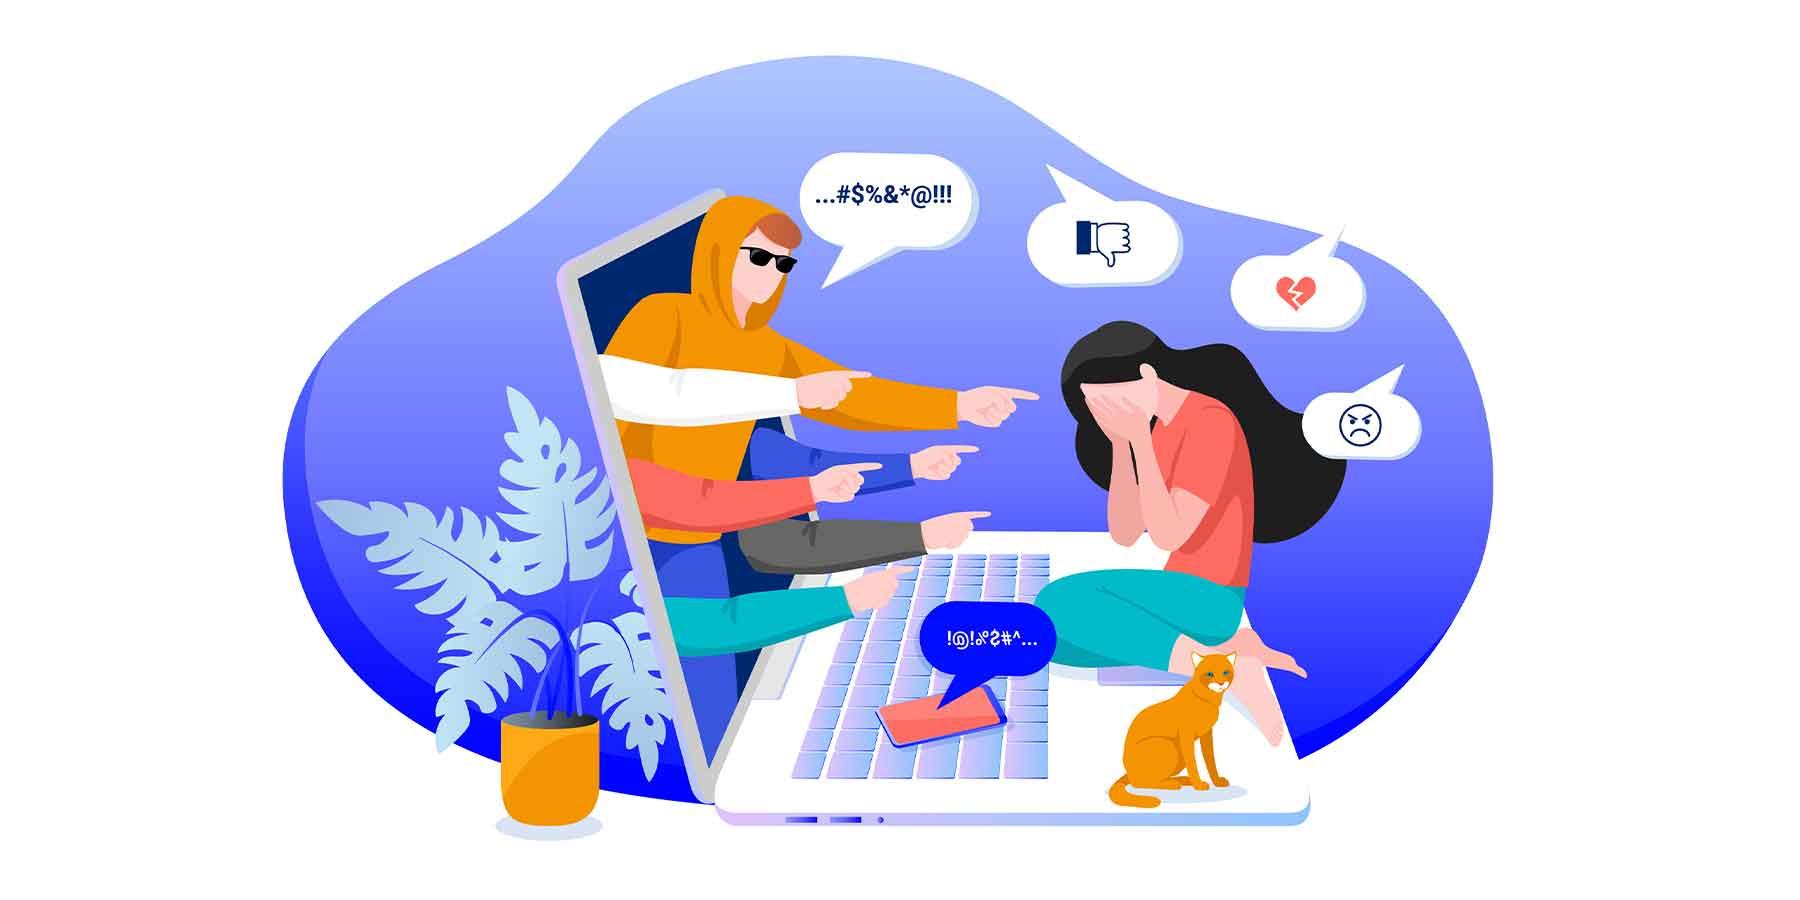 cyberbullying in India